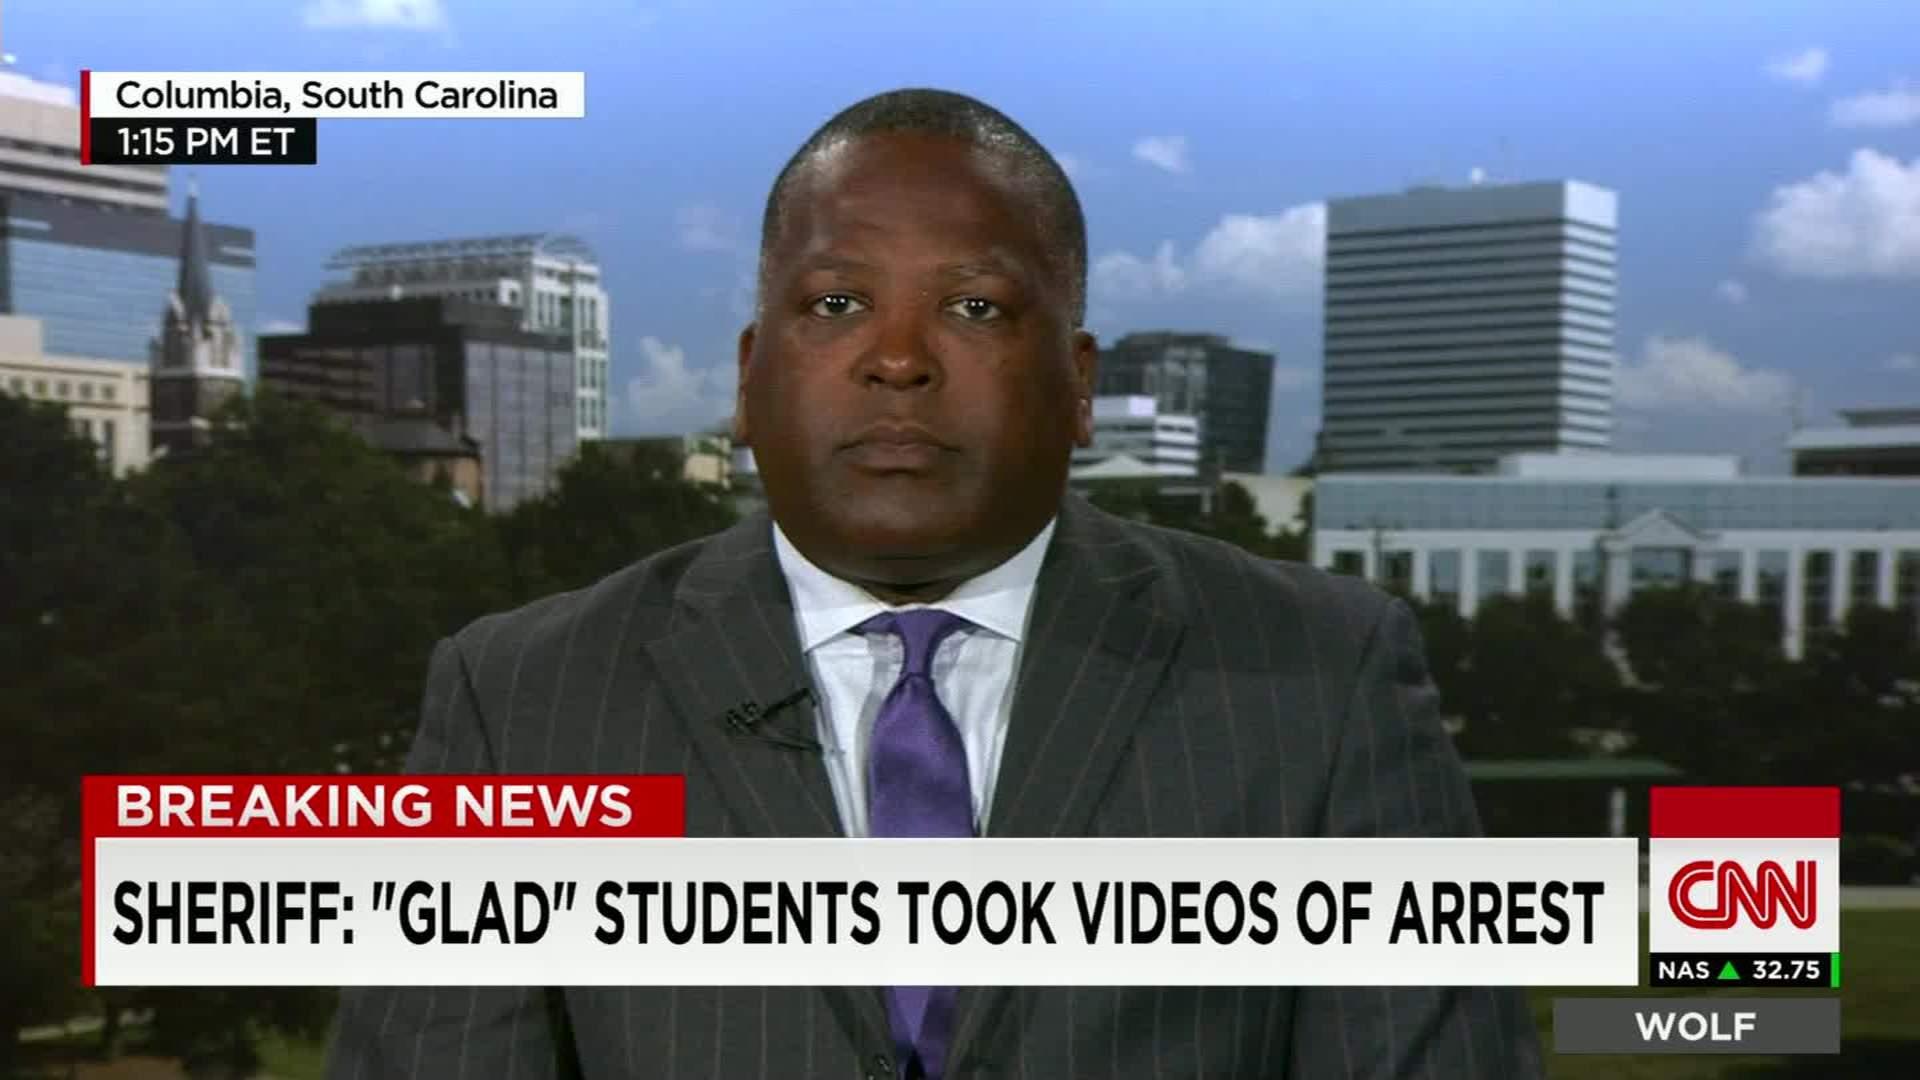 SC Mayor reacts to firing of officer in school assault CNN Video